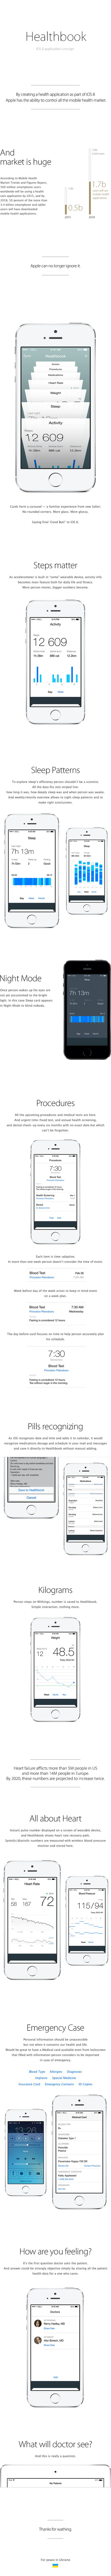 Healthbook iOS 8 concept by Valera Vasylenko, via Behance